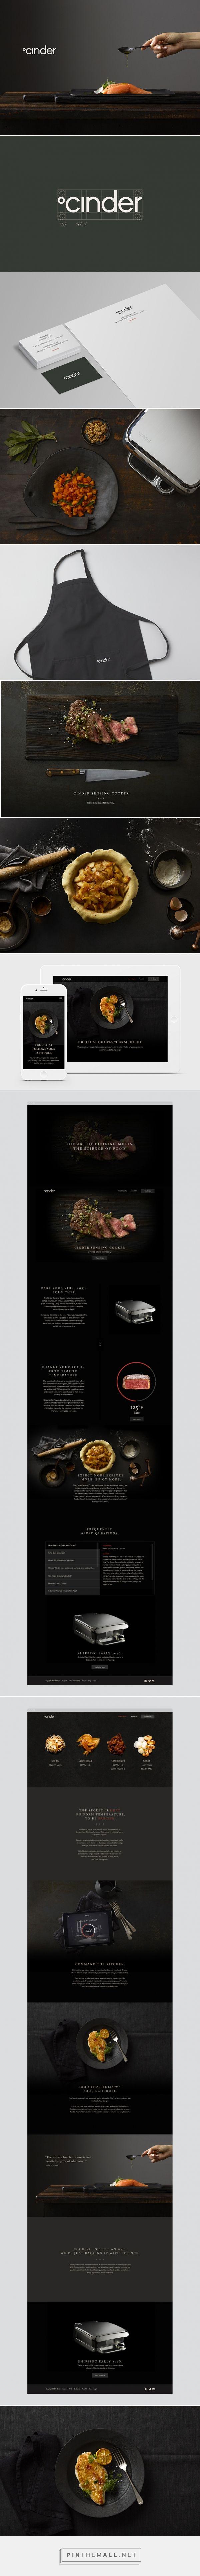 Cinder | Visual Journal